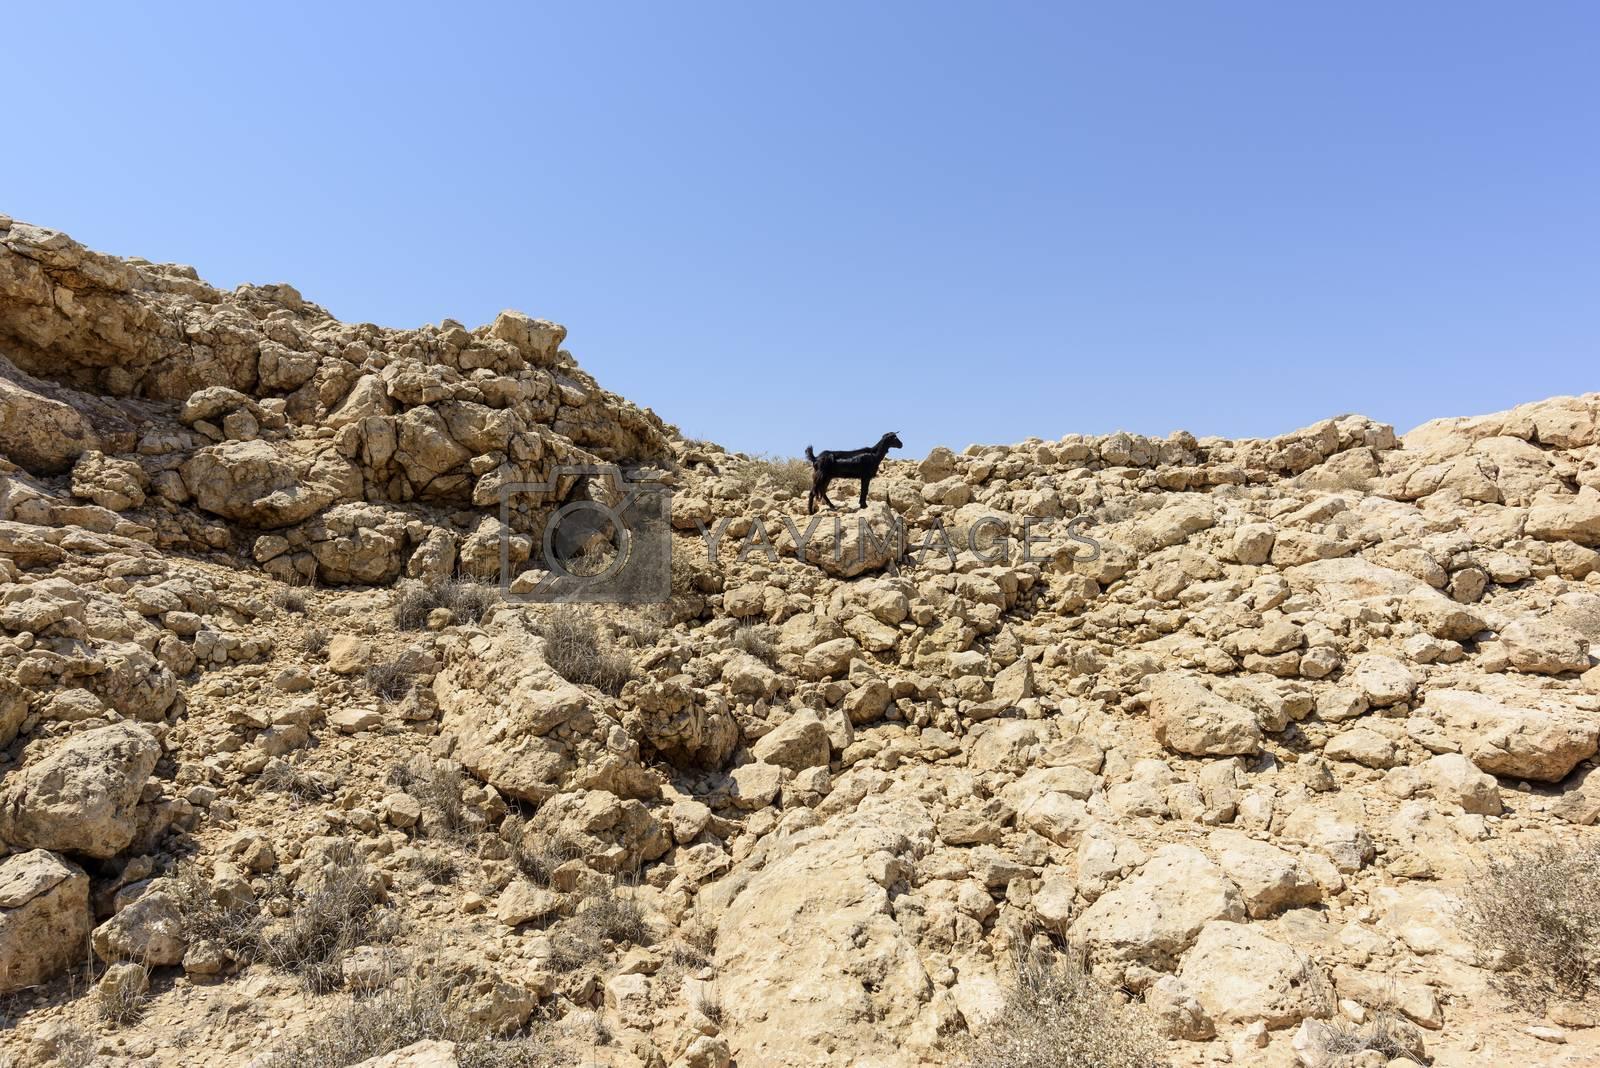 Single black sheep in the mountain, Ras Al jinz, Sultanate of Oman